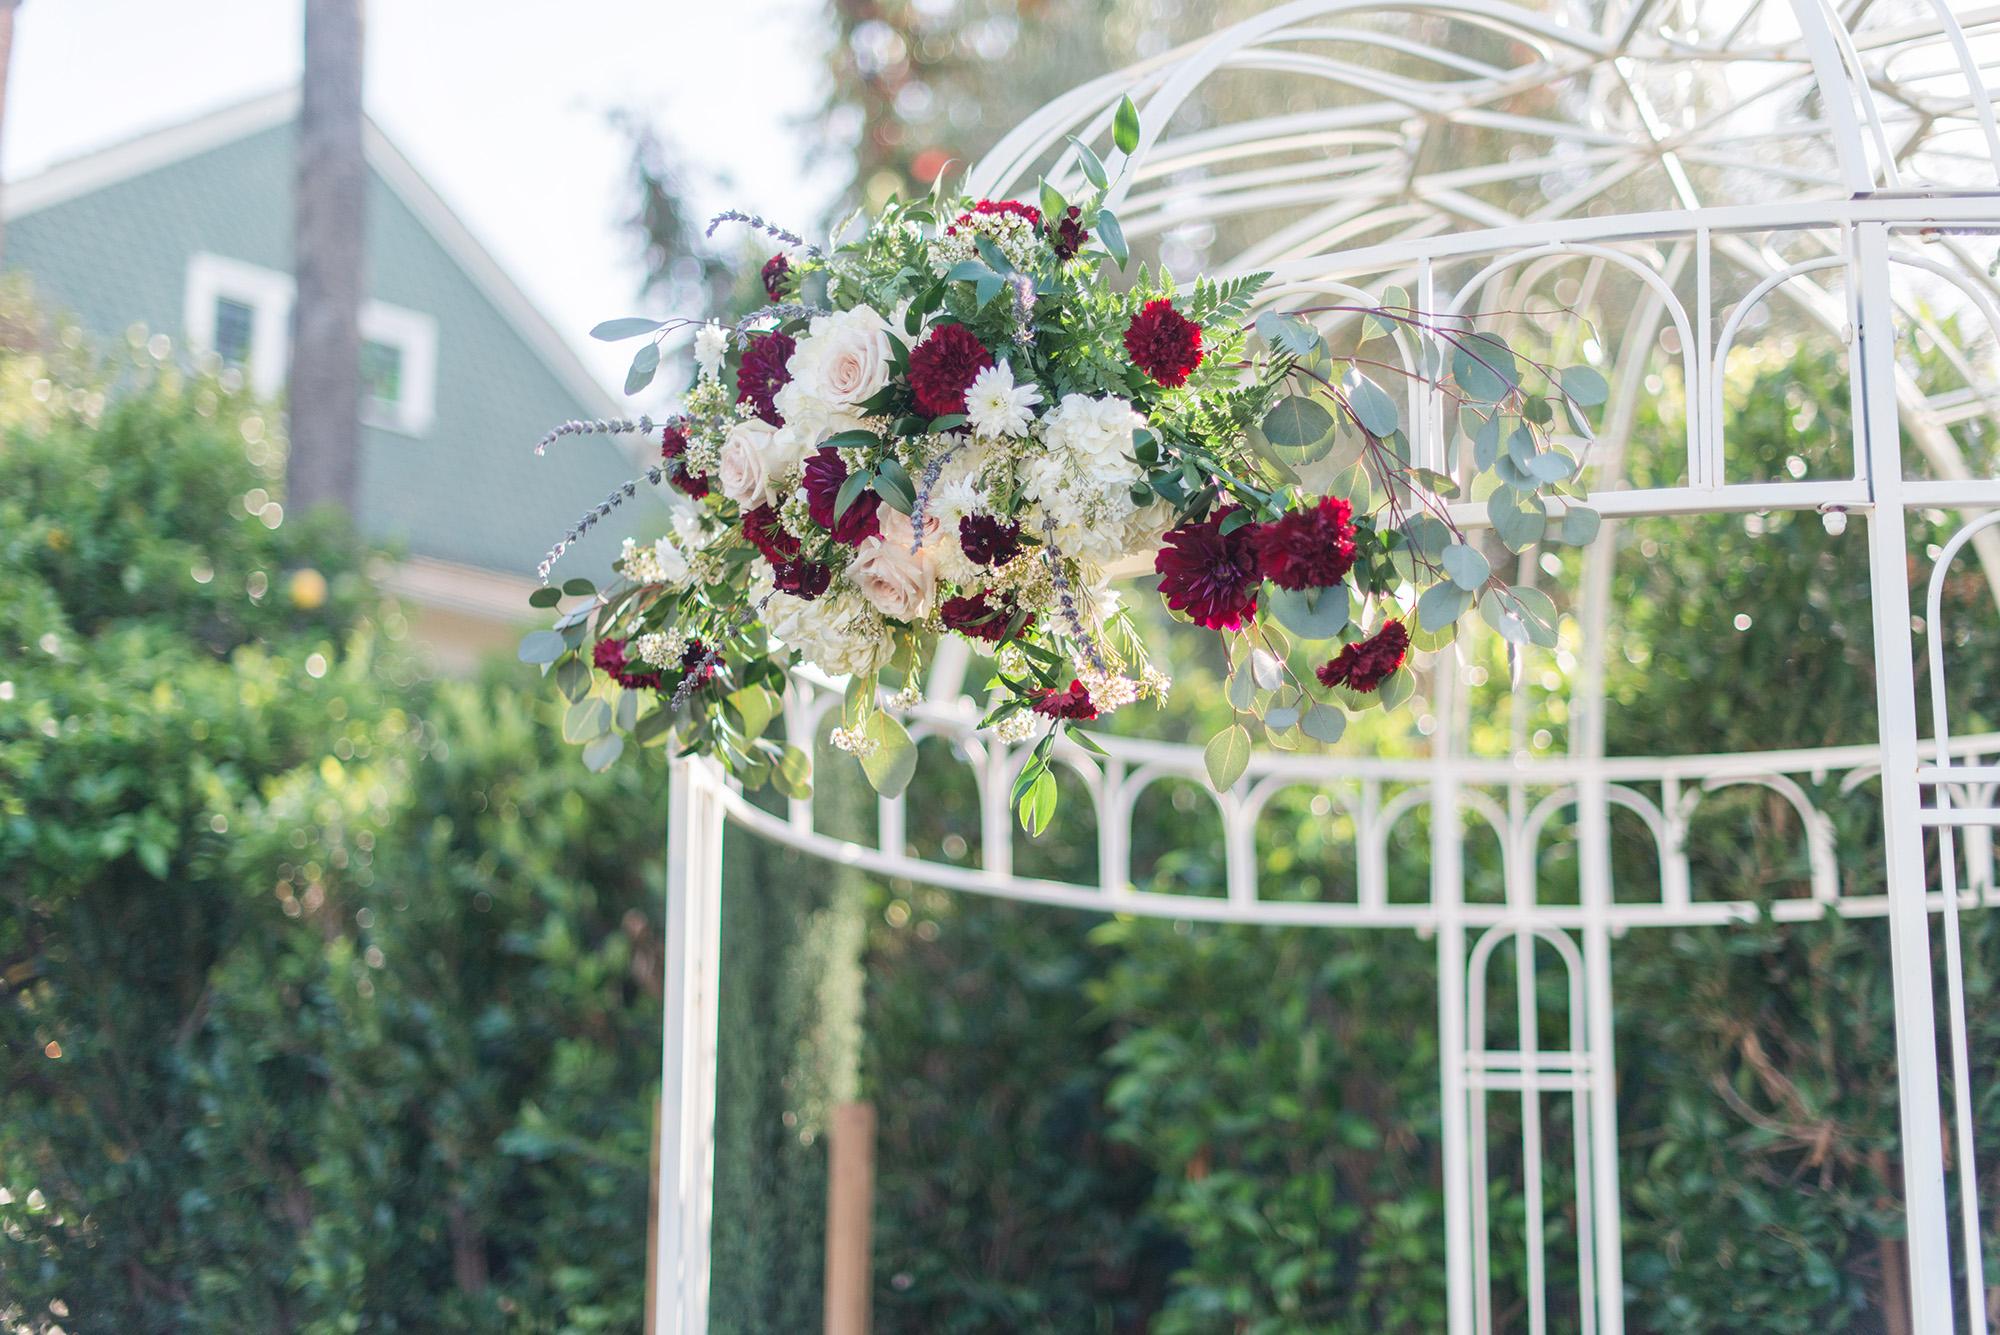 associate-photographer-christmas-house-wedding-carrie-vines-0034.jpg